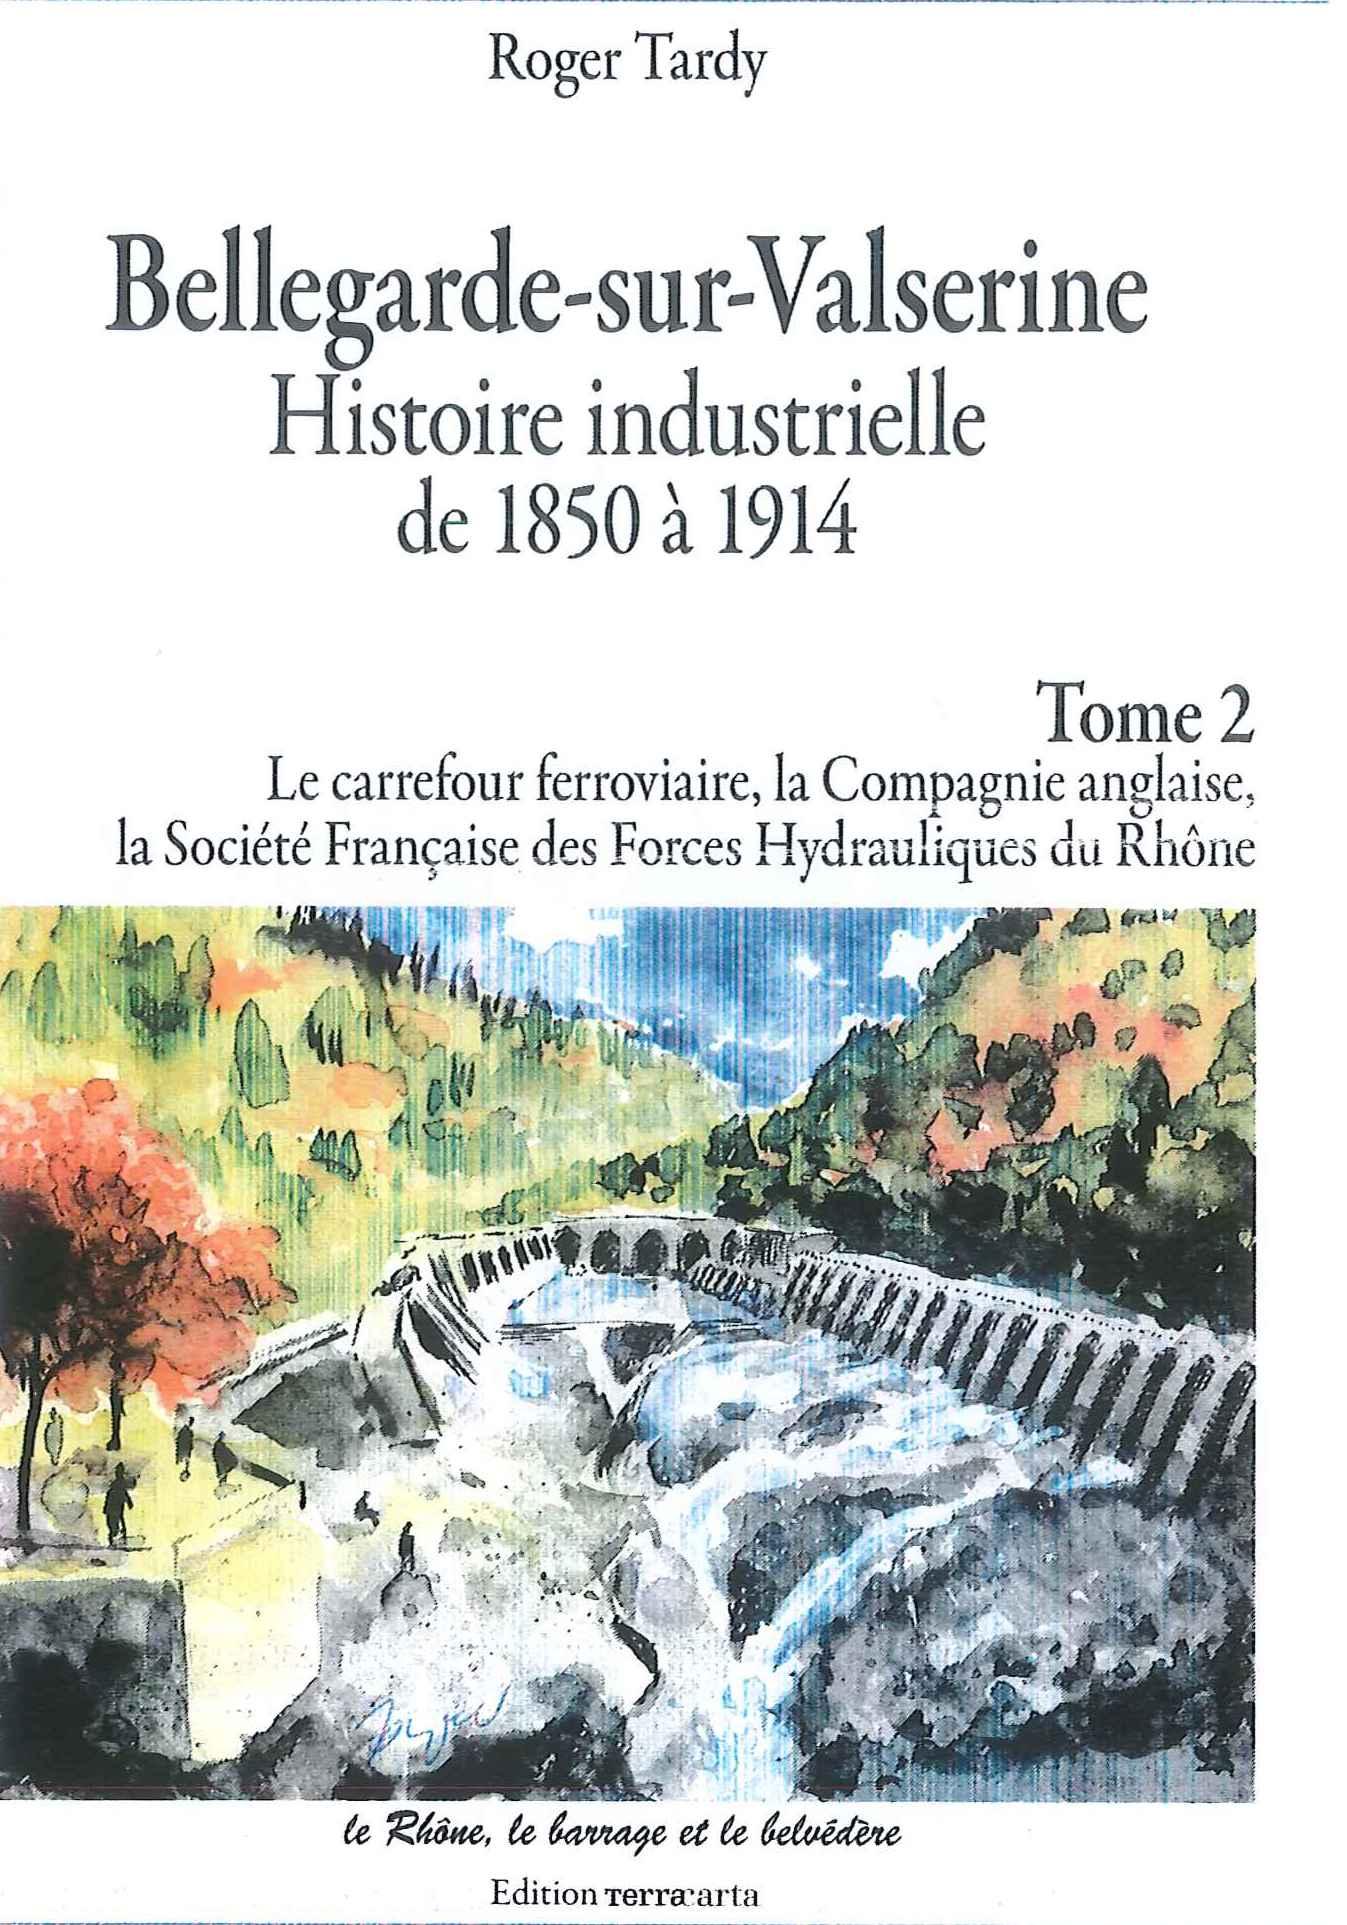 Bellegarde Histoire industrielle Tardy